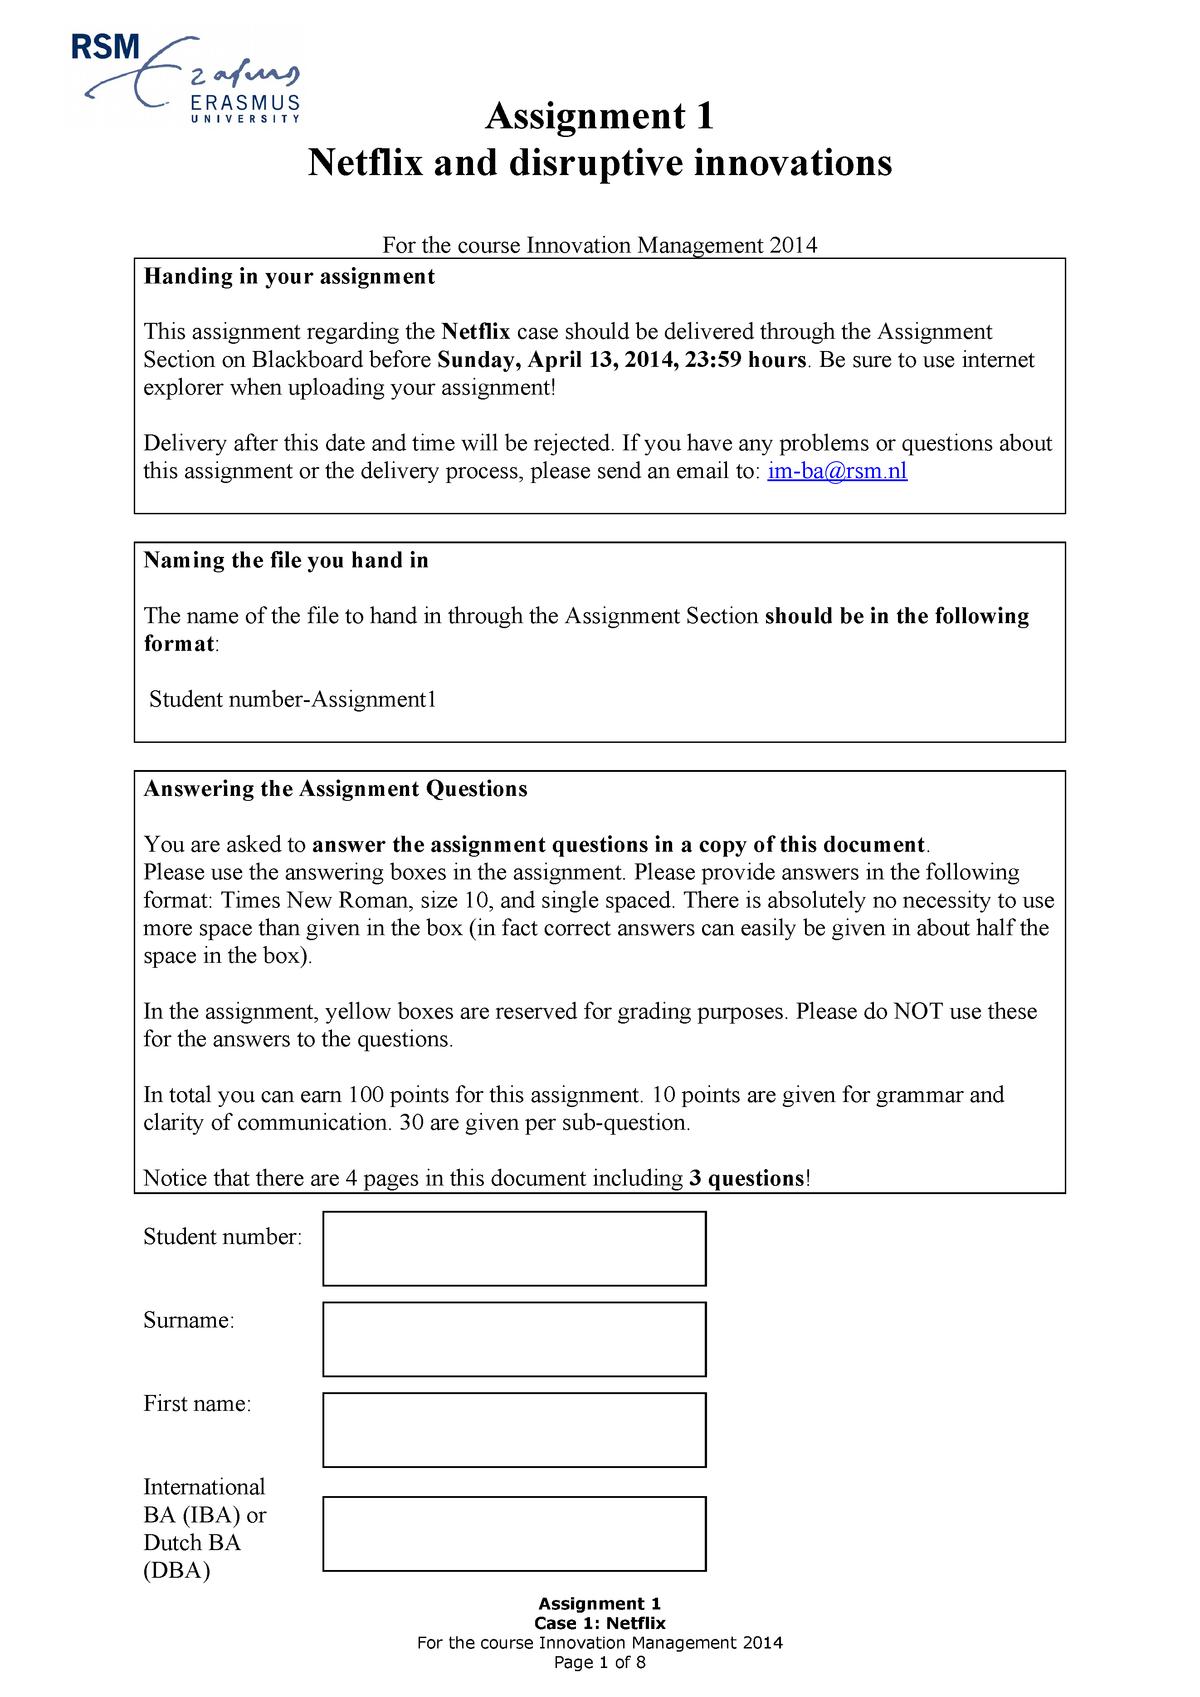 Seminar assignments - case 1